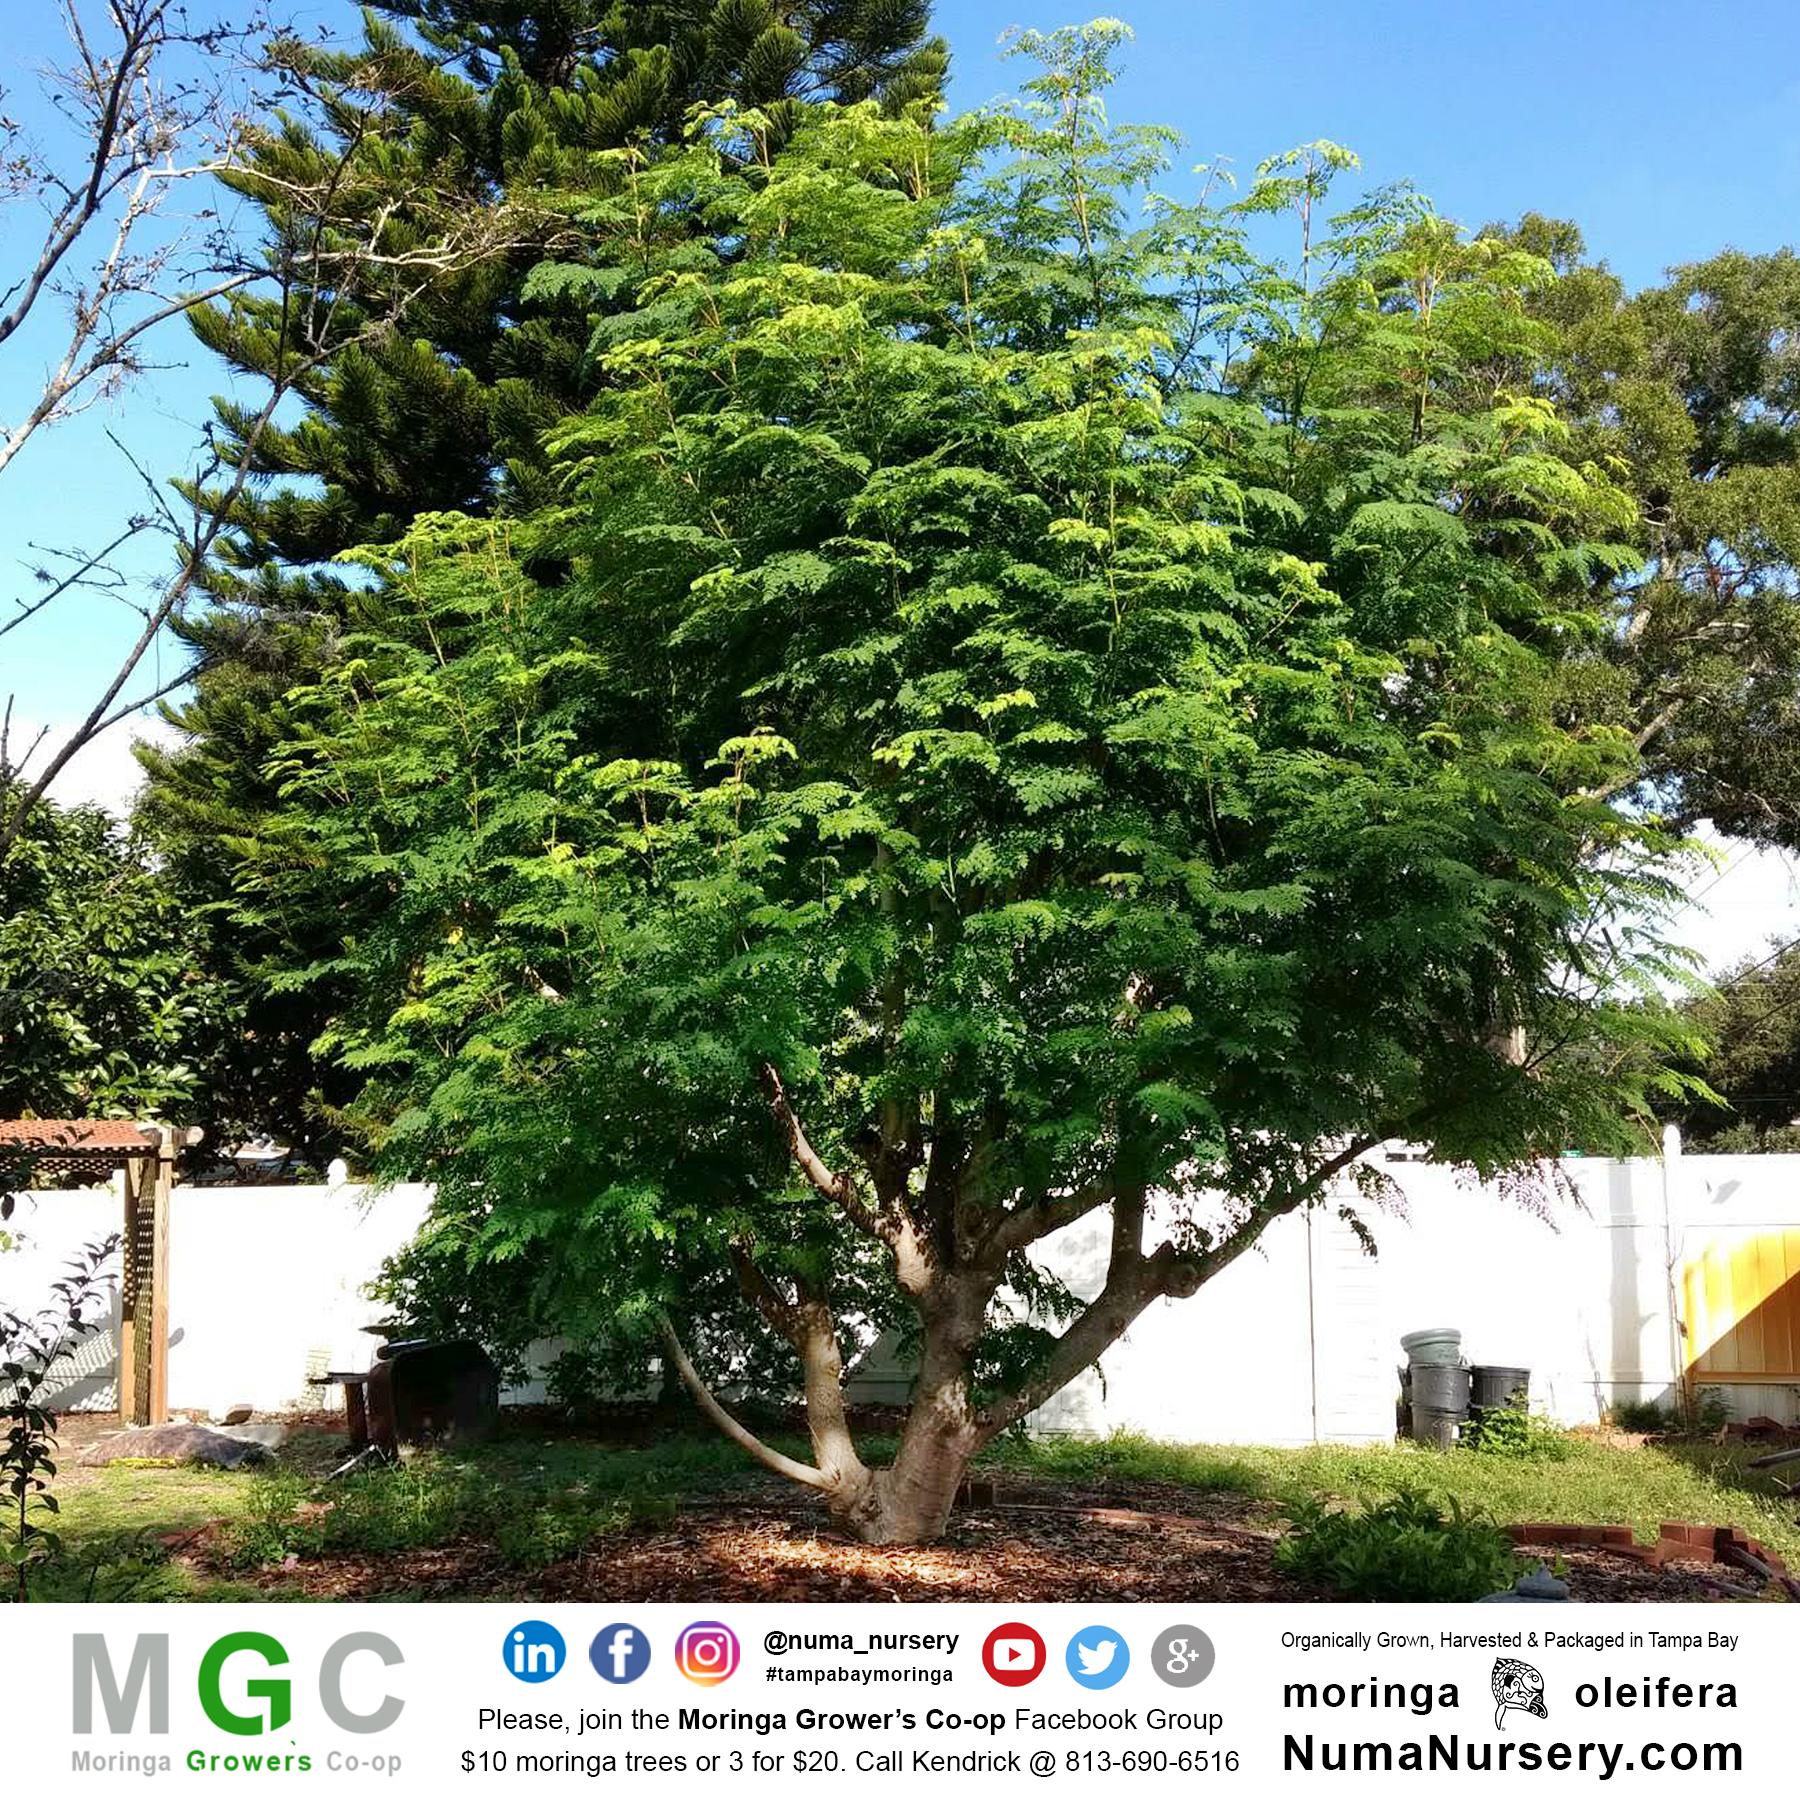 huge moringa tree